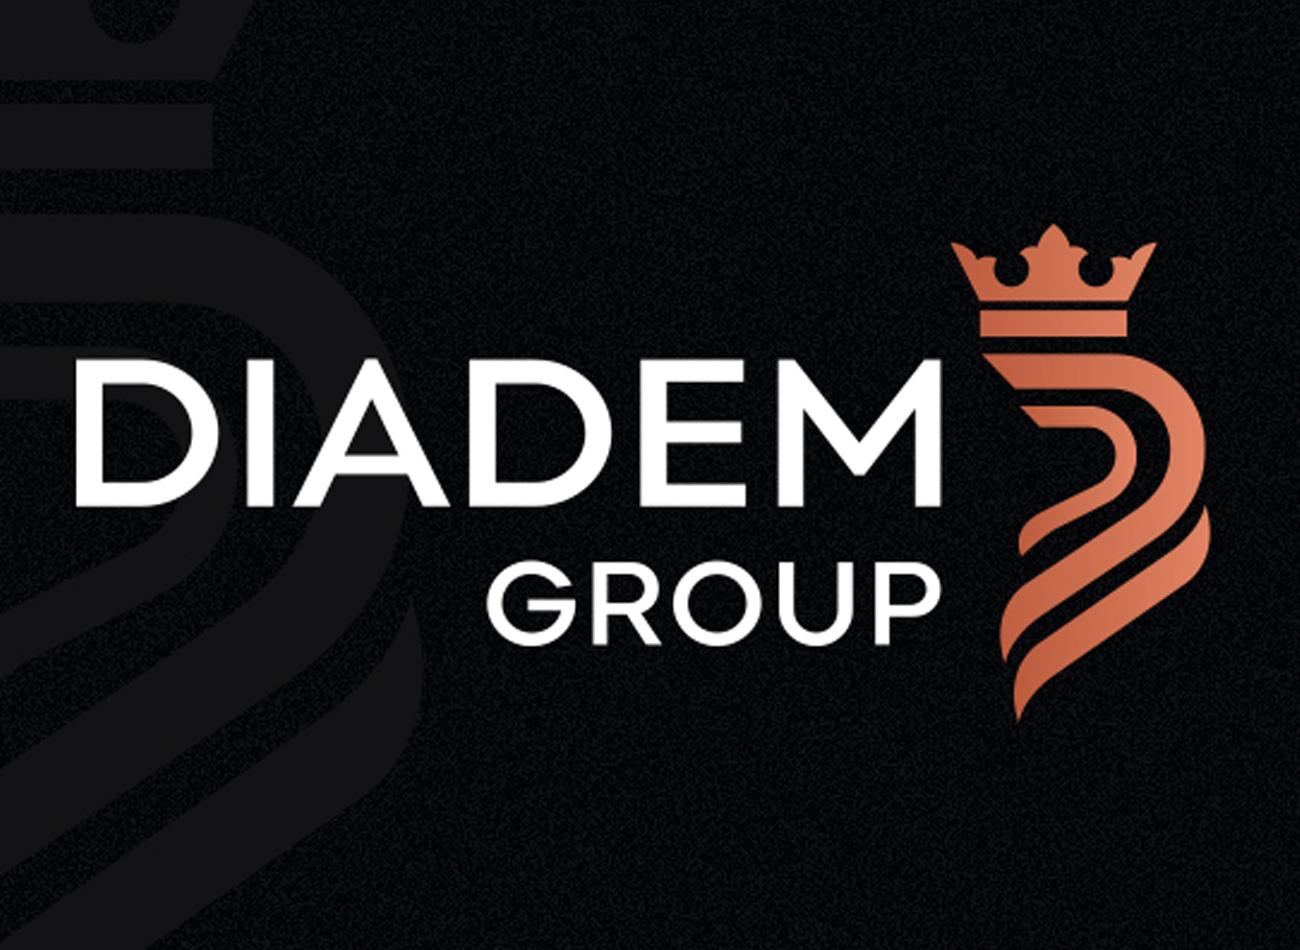 diadem-graphic-Corporate-Identity-Agent-Orange-Design-Thumbnail.jpg